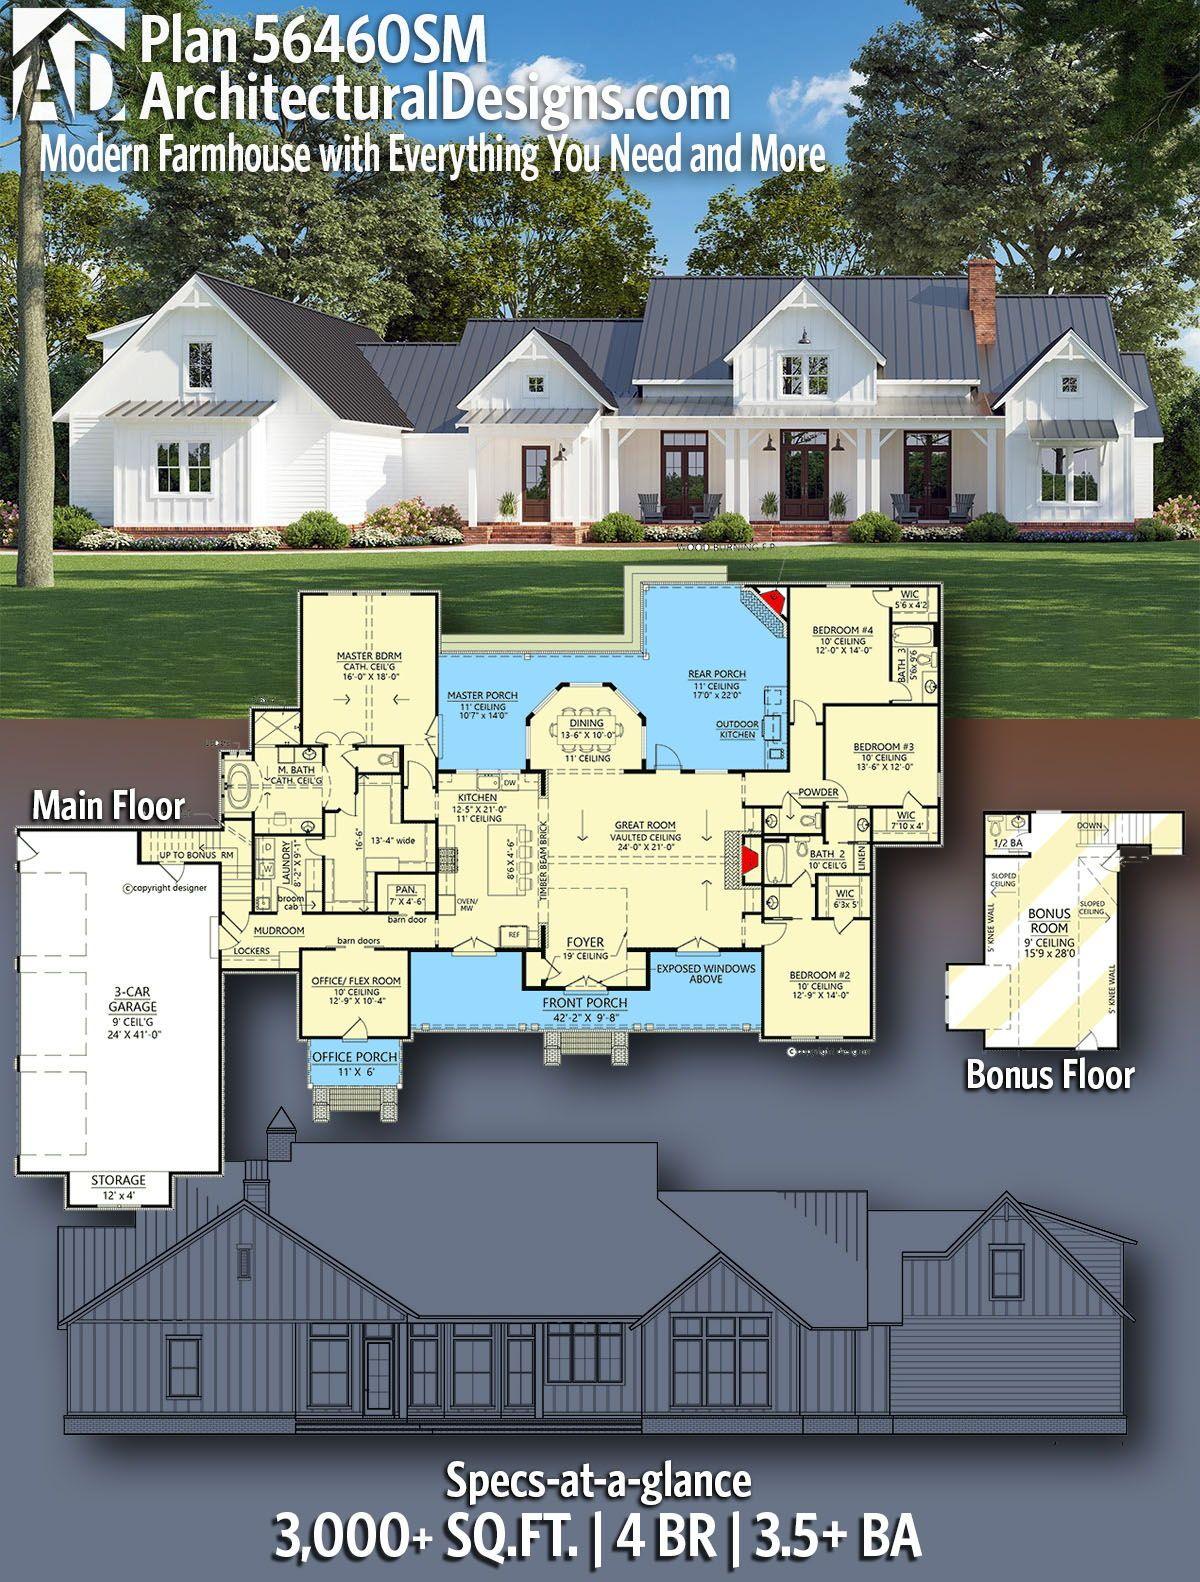 Plan 56460sm Modern Farmhouse With Everything You Need And More In 2020 House Plans Farmhouse Farmhouse Style House Plans New House Plans